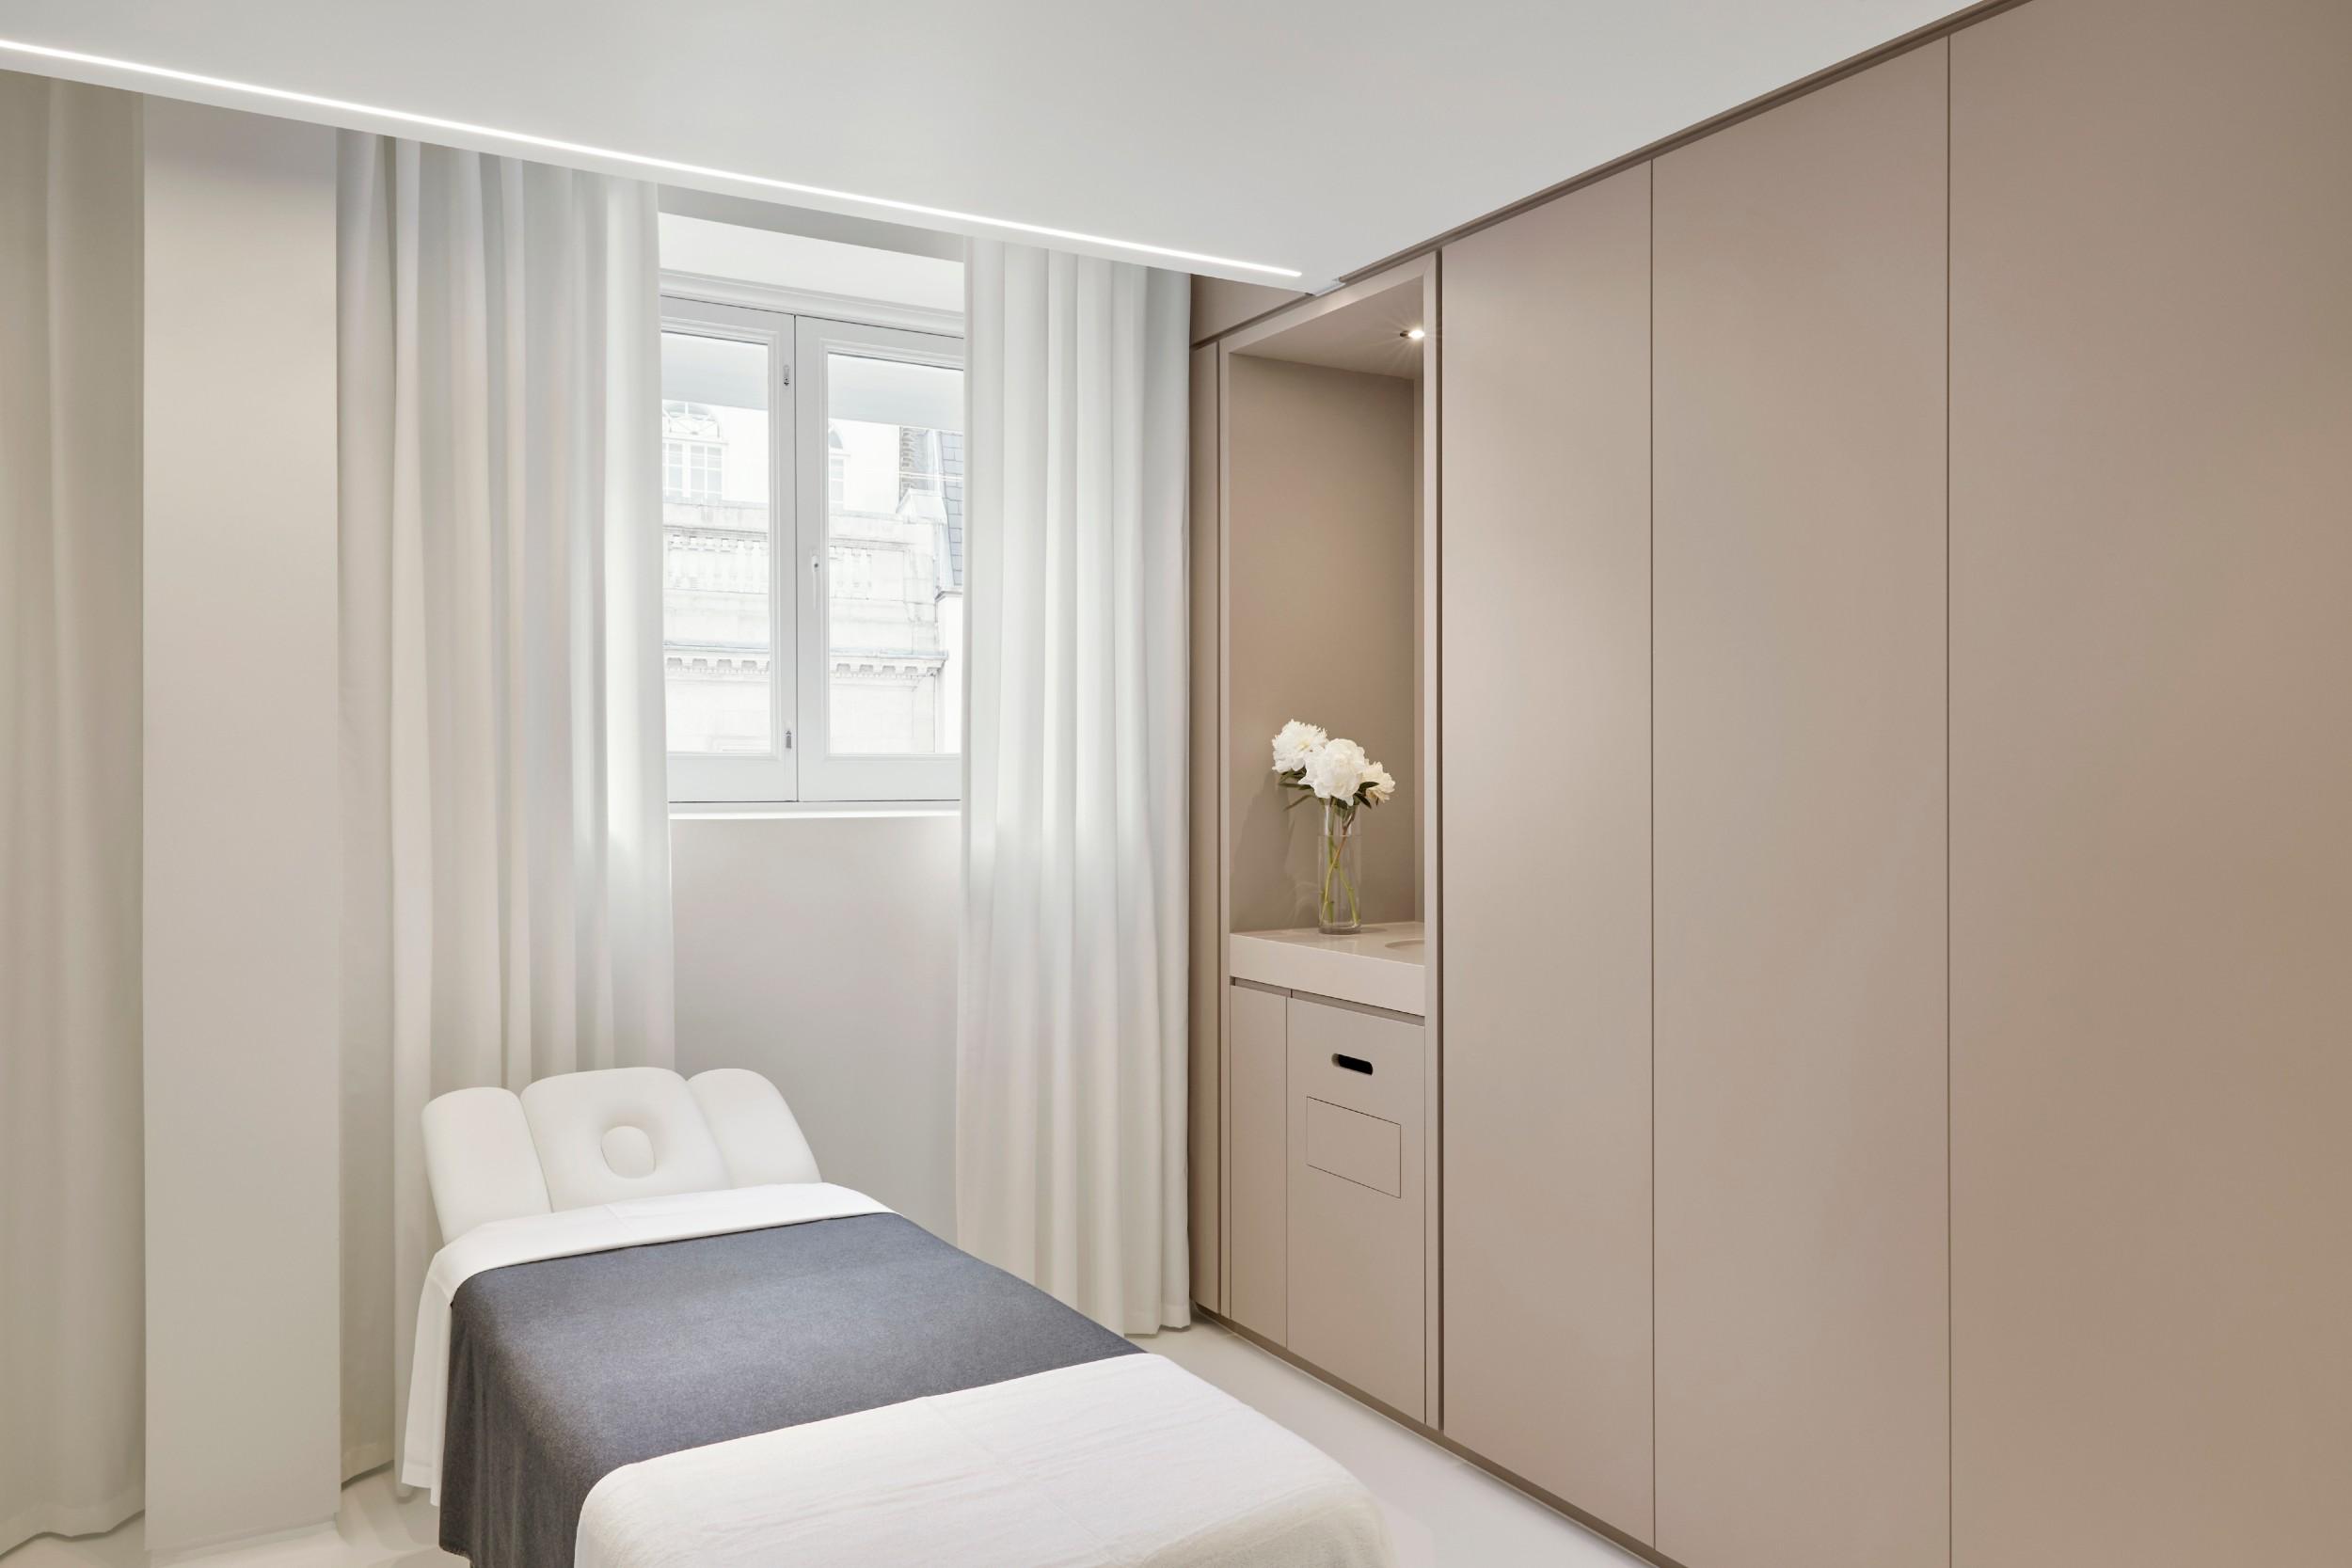 lanserhof_at_the_arts_club_treatment_room (1).jpg